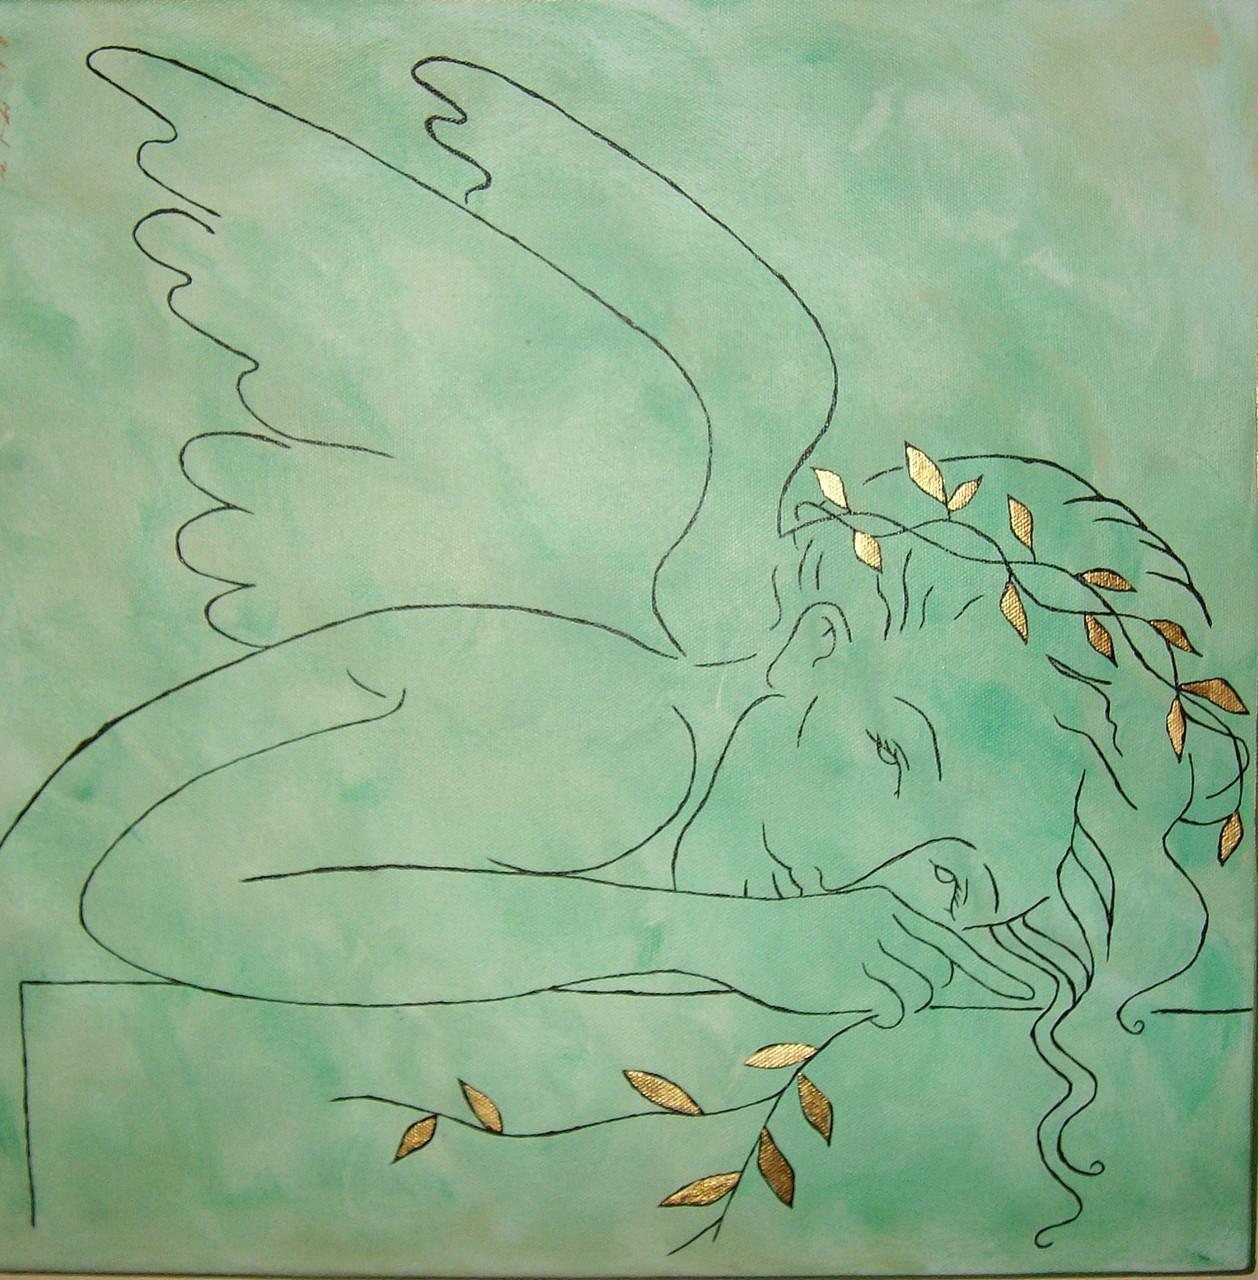 Grüner Energie Engel